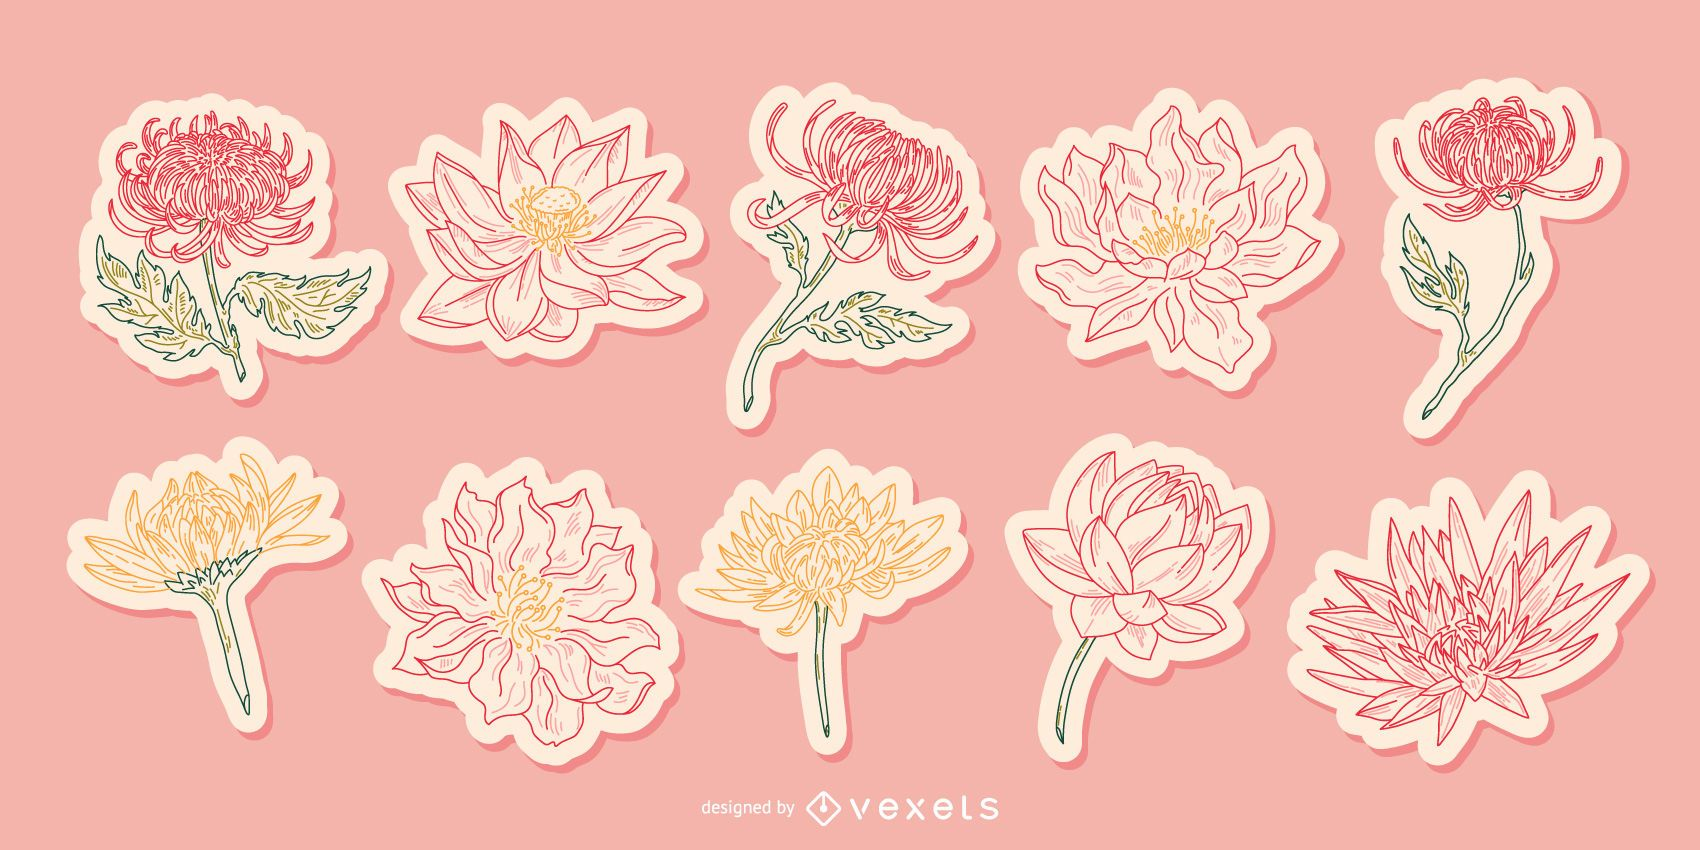 Pacote de adesivos ilustrados de flores chinesas